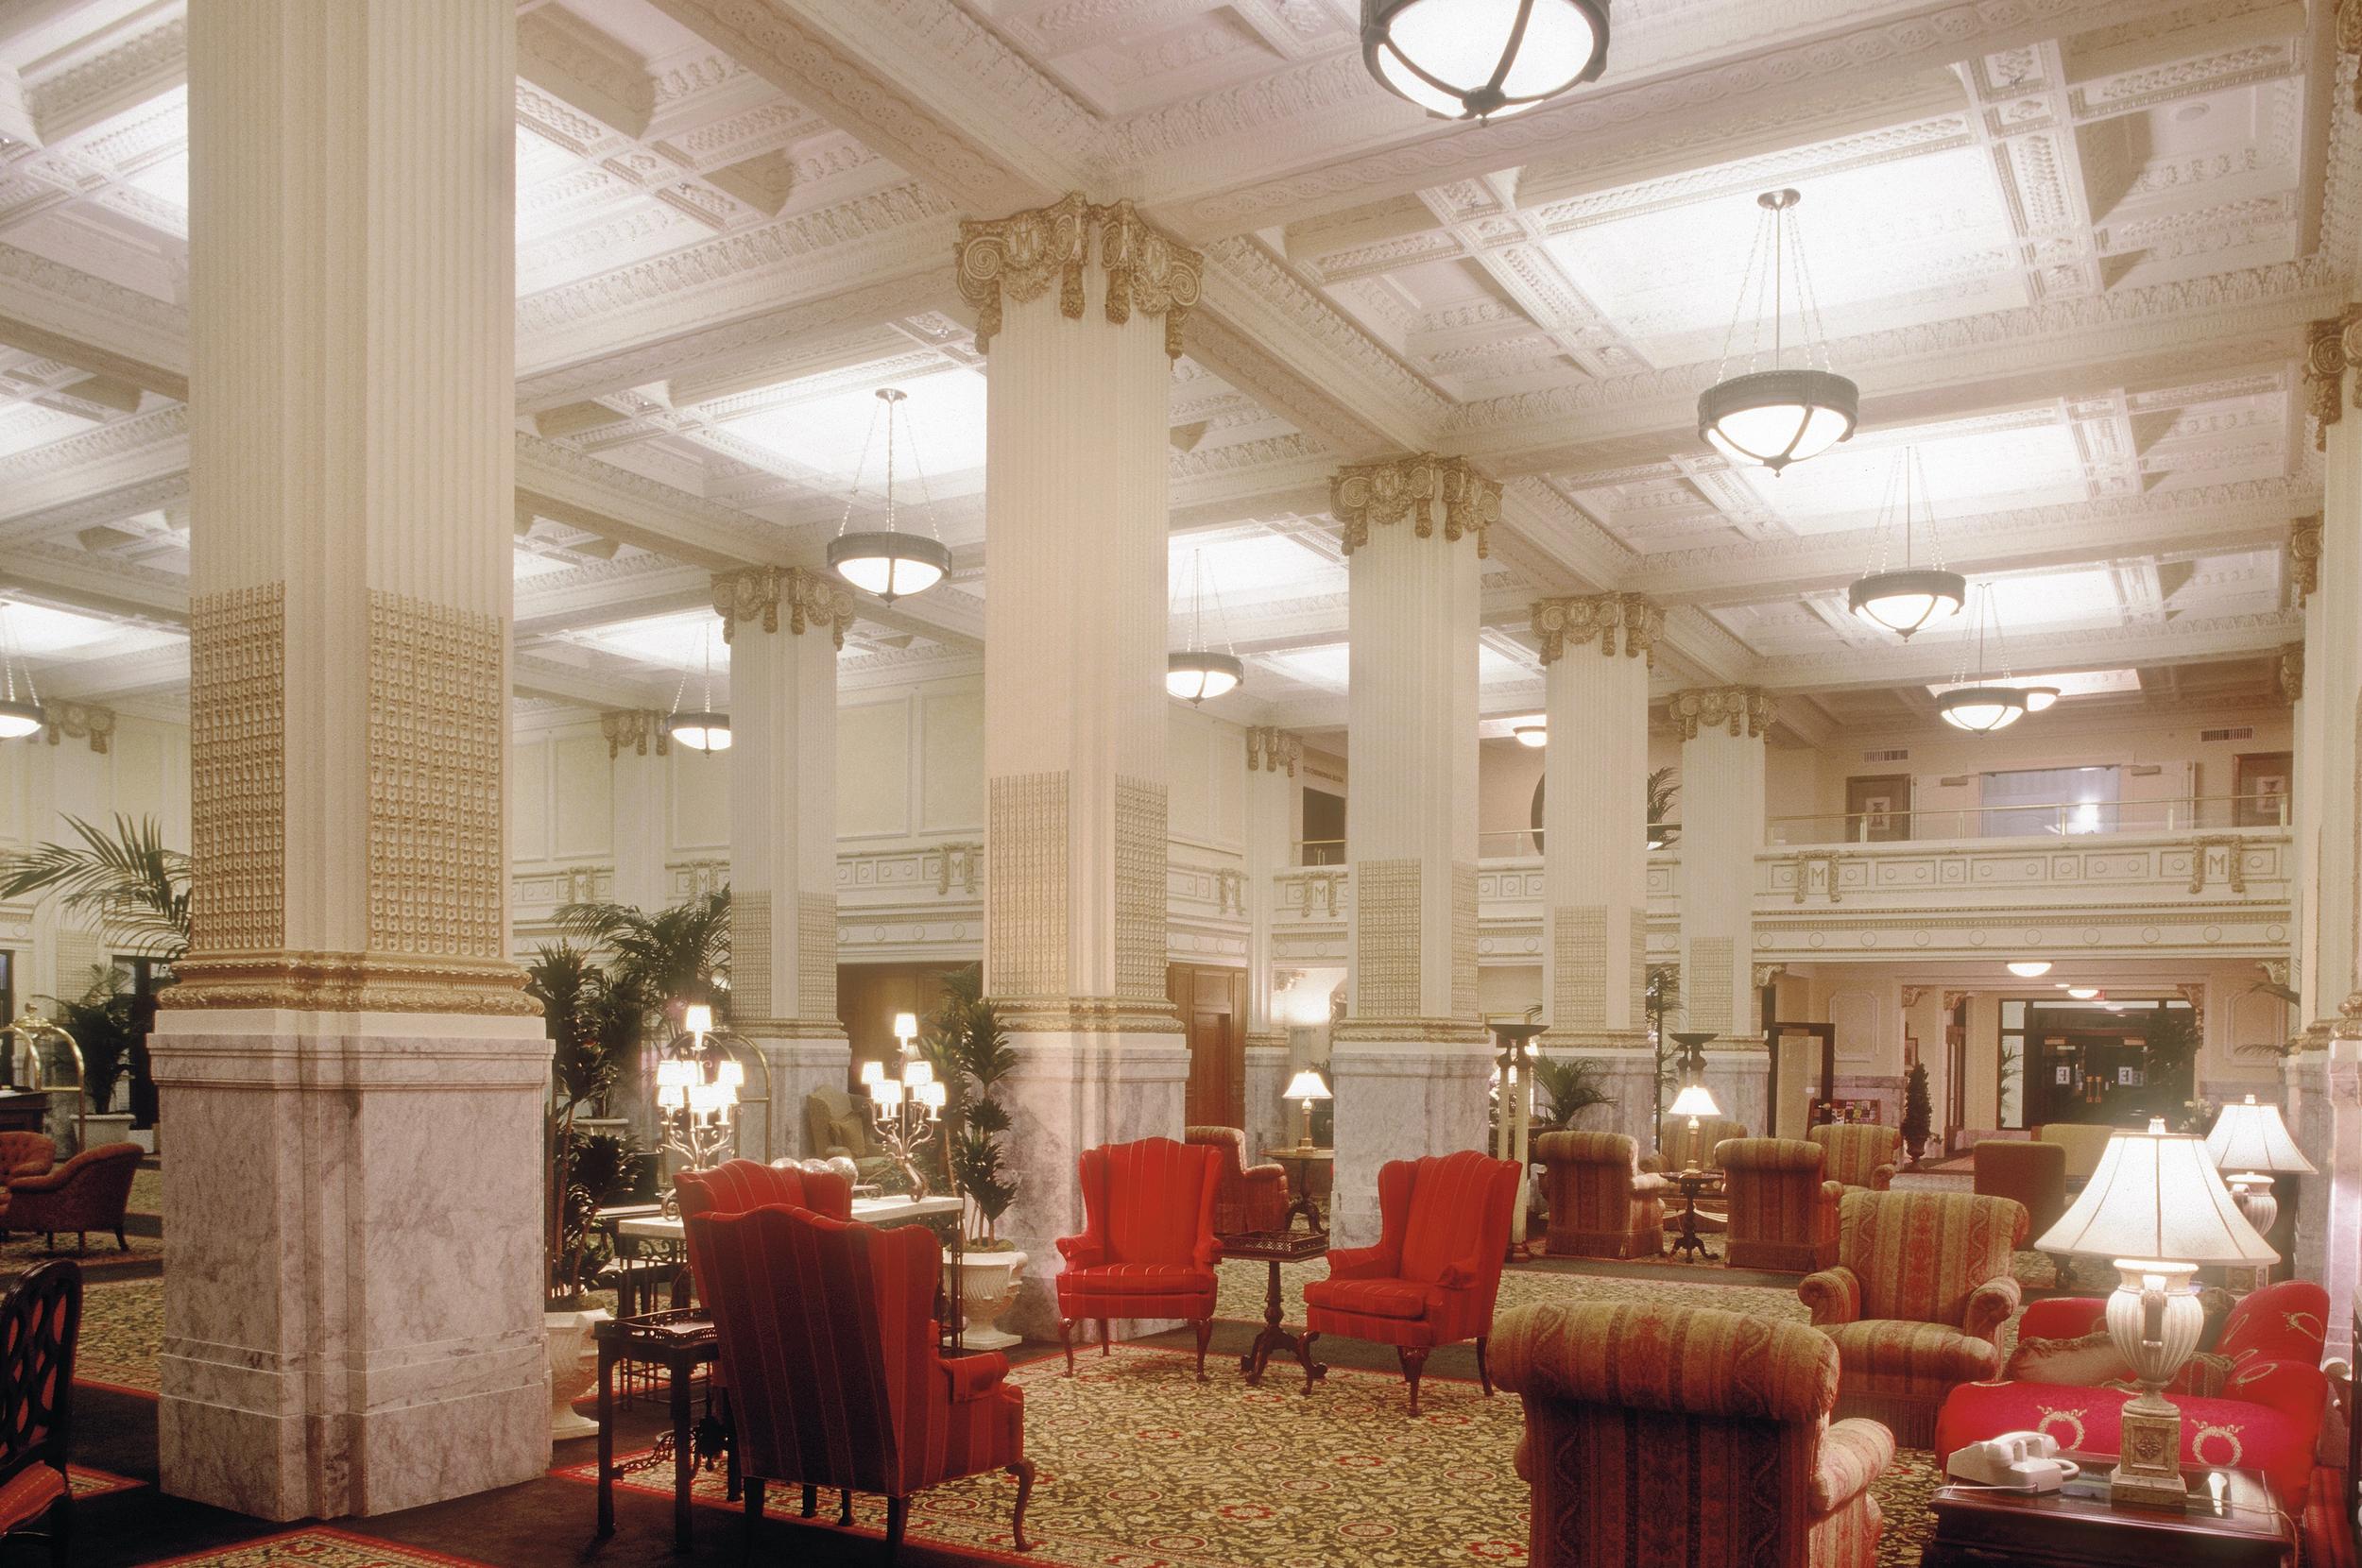 Embassy Suites Hotel at The Multnomah, Portland, Oregon